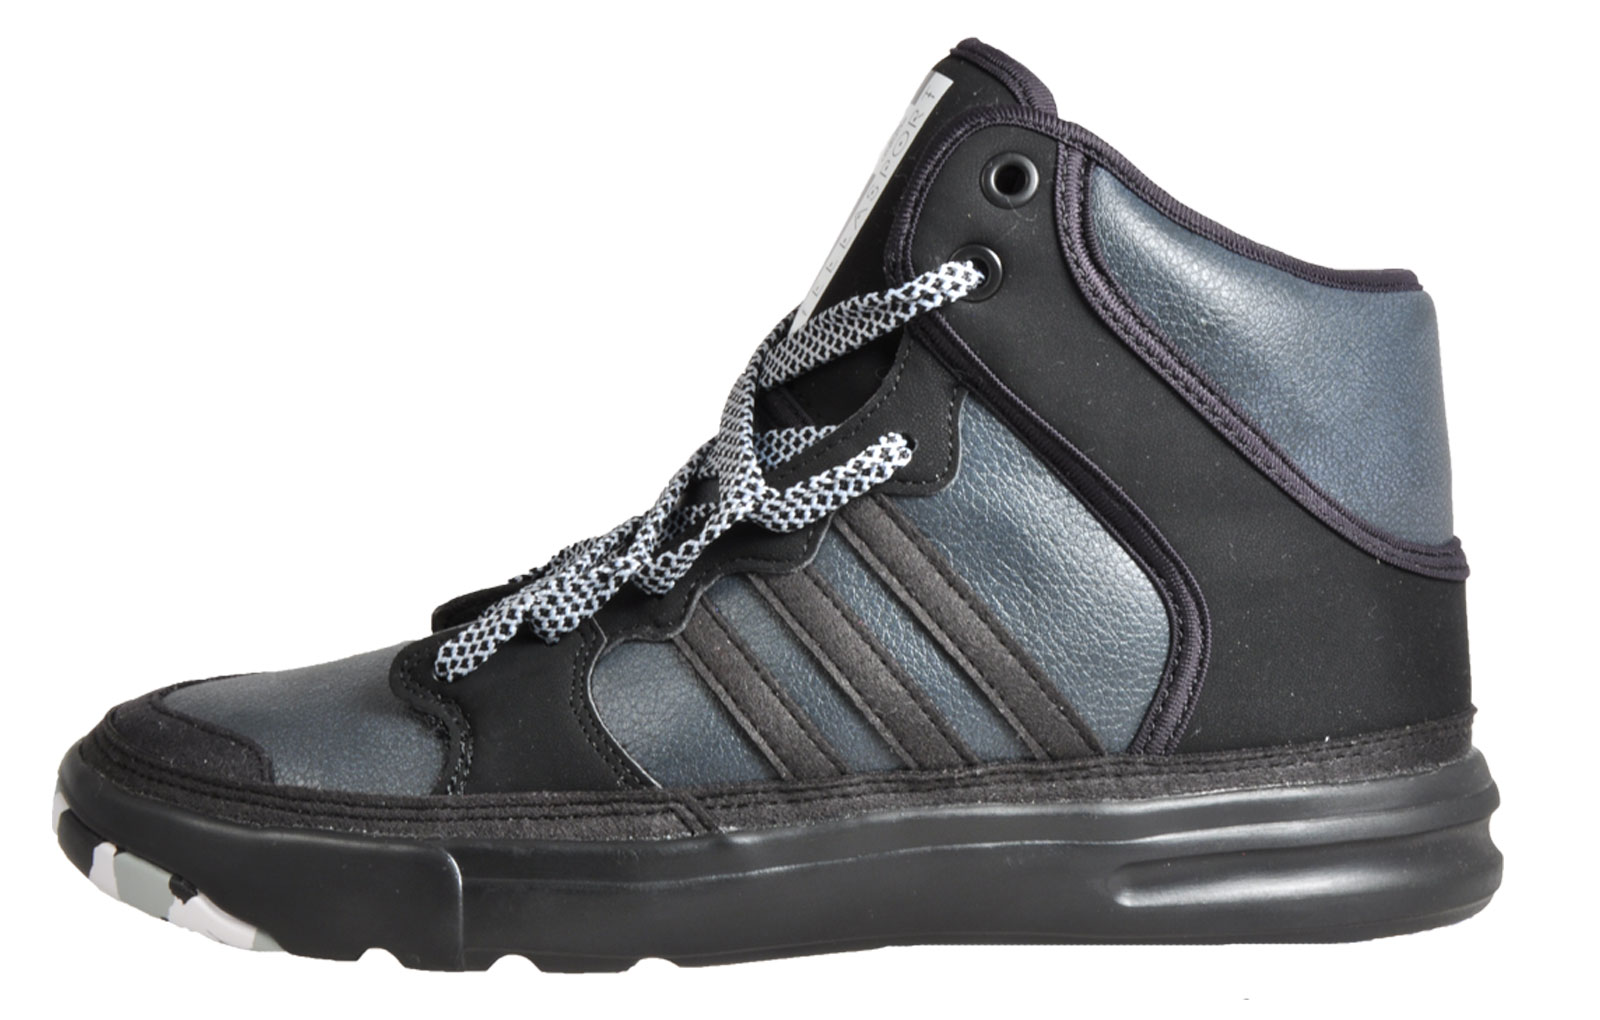 Adidas Zapatos Stellasport Irana dfKKqAUg